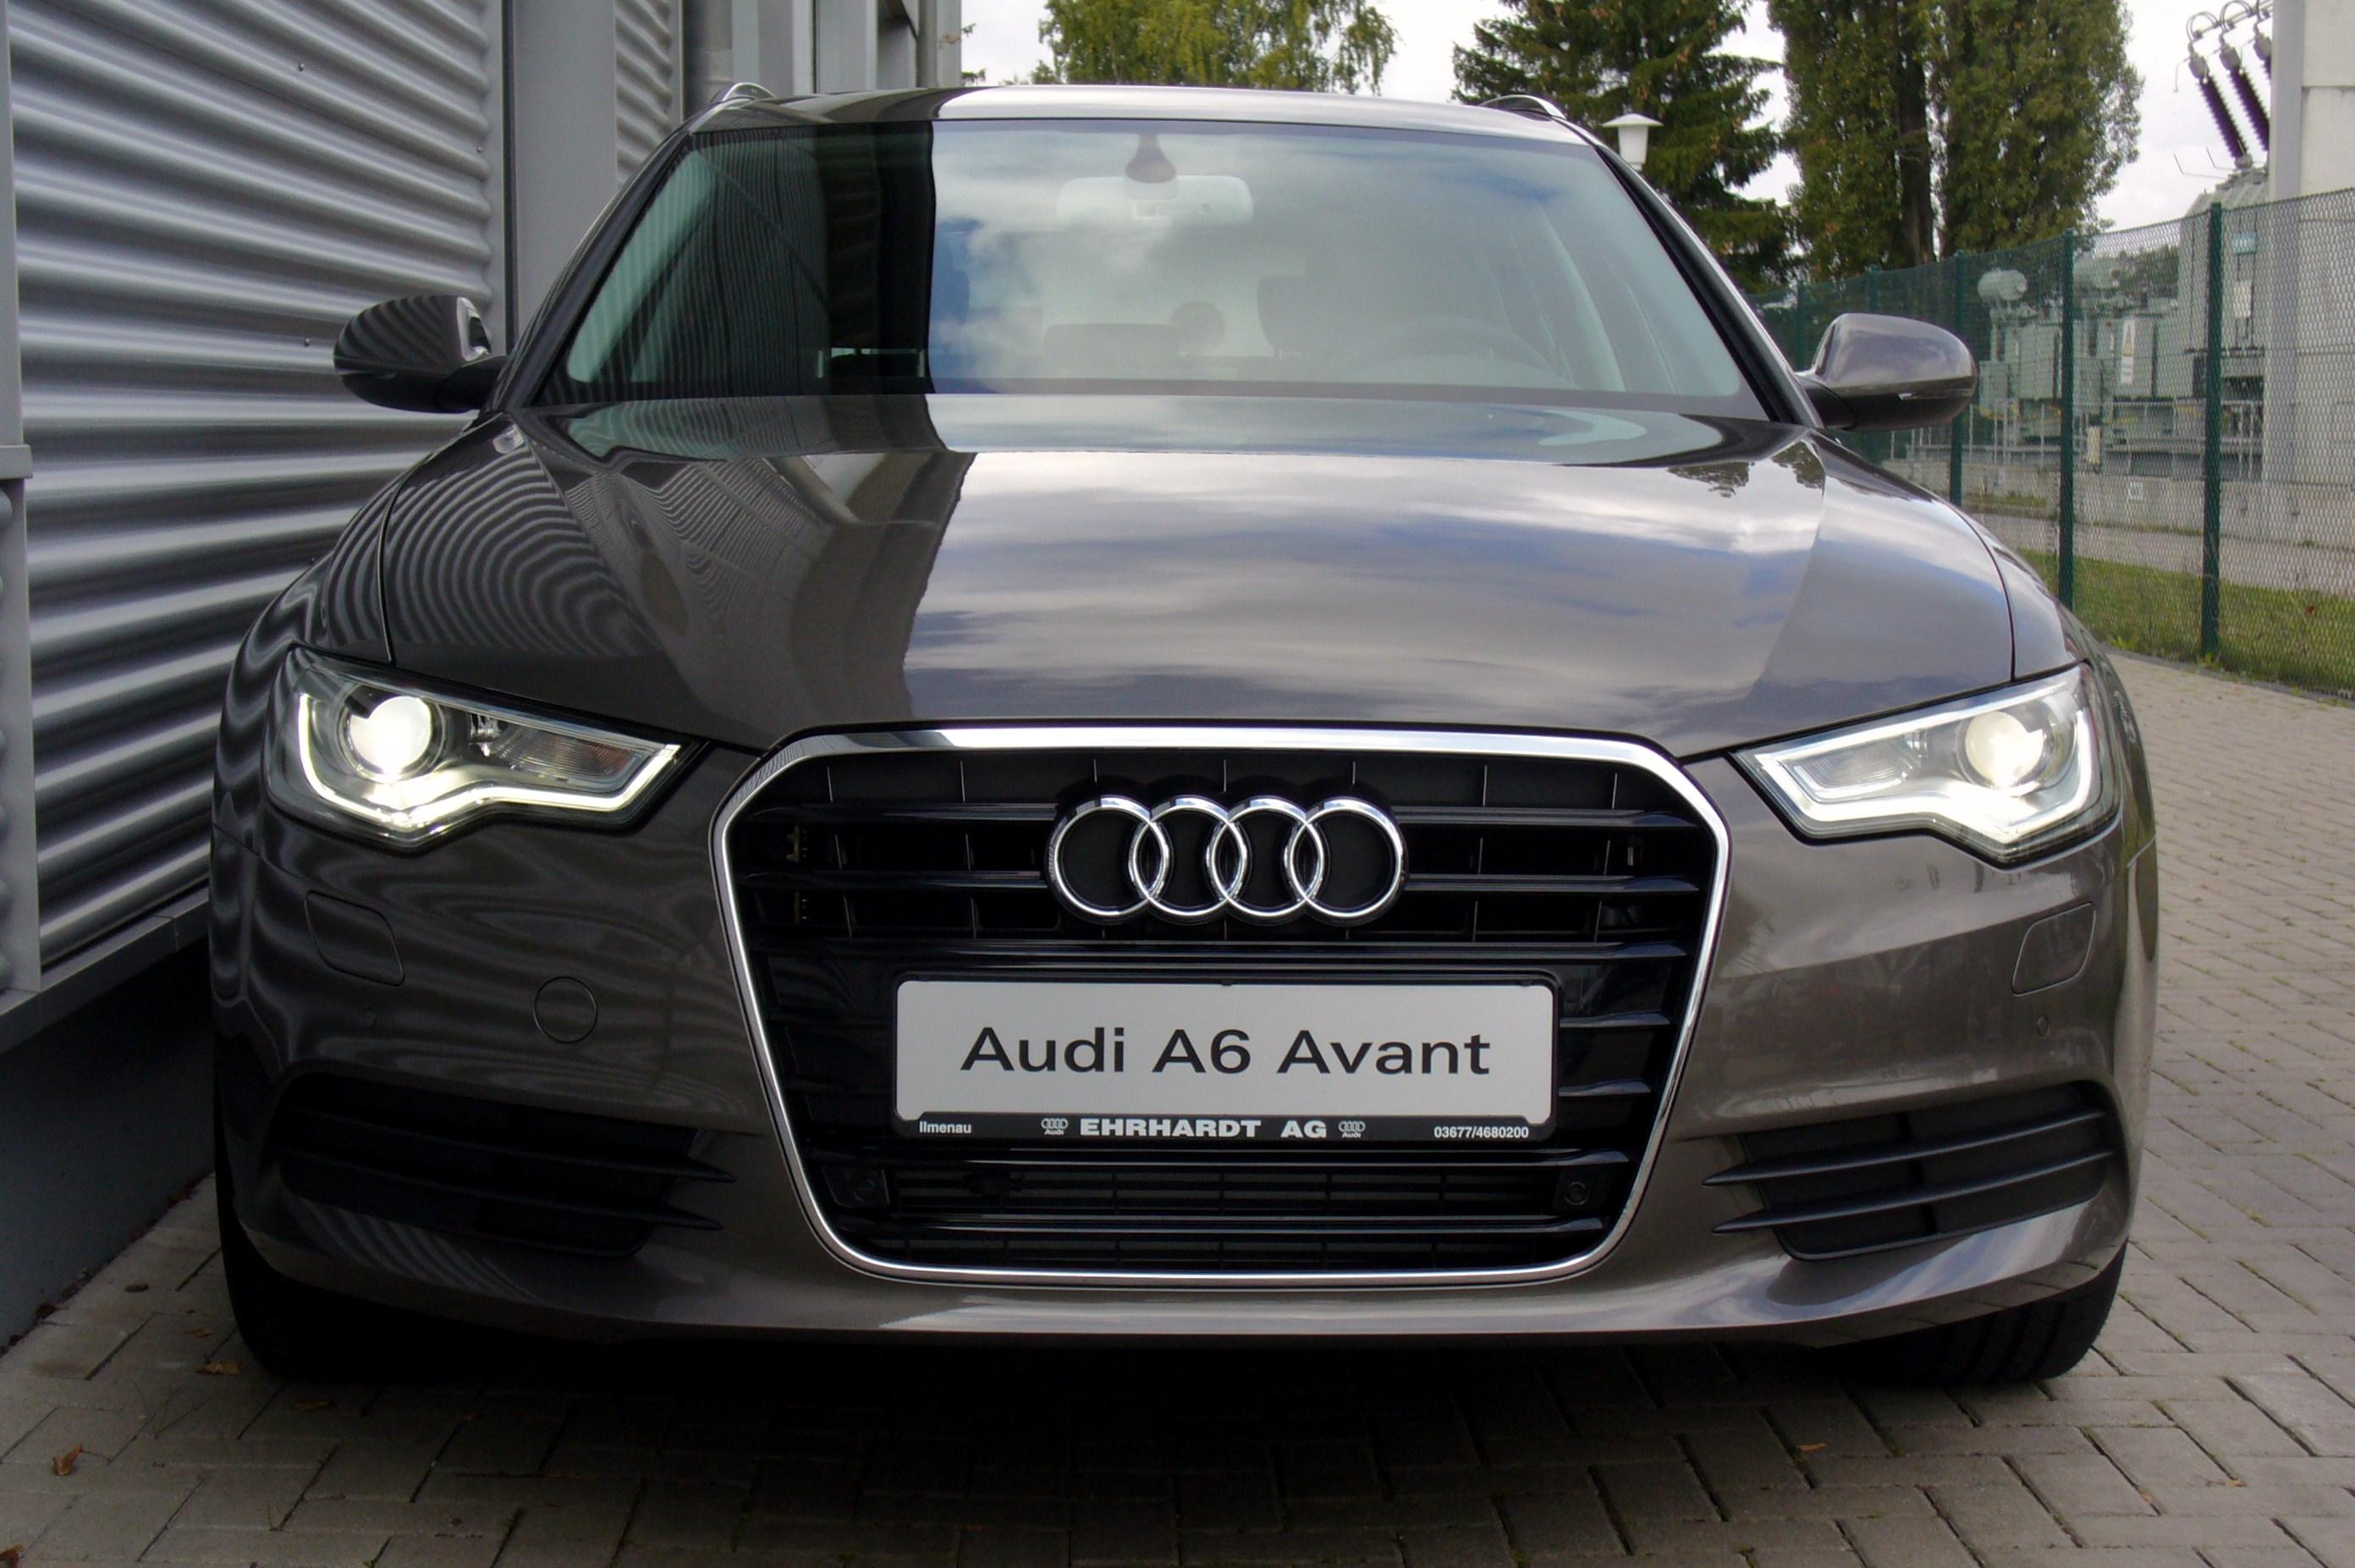 Audi_A6_Avant_2.0_TDI_Dakotagrau_Front.JPG